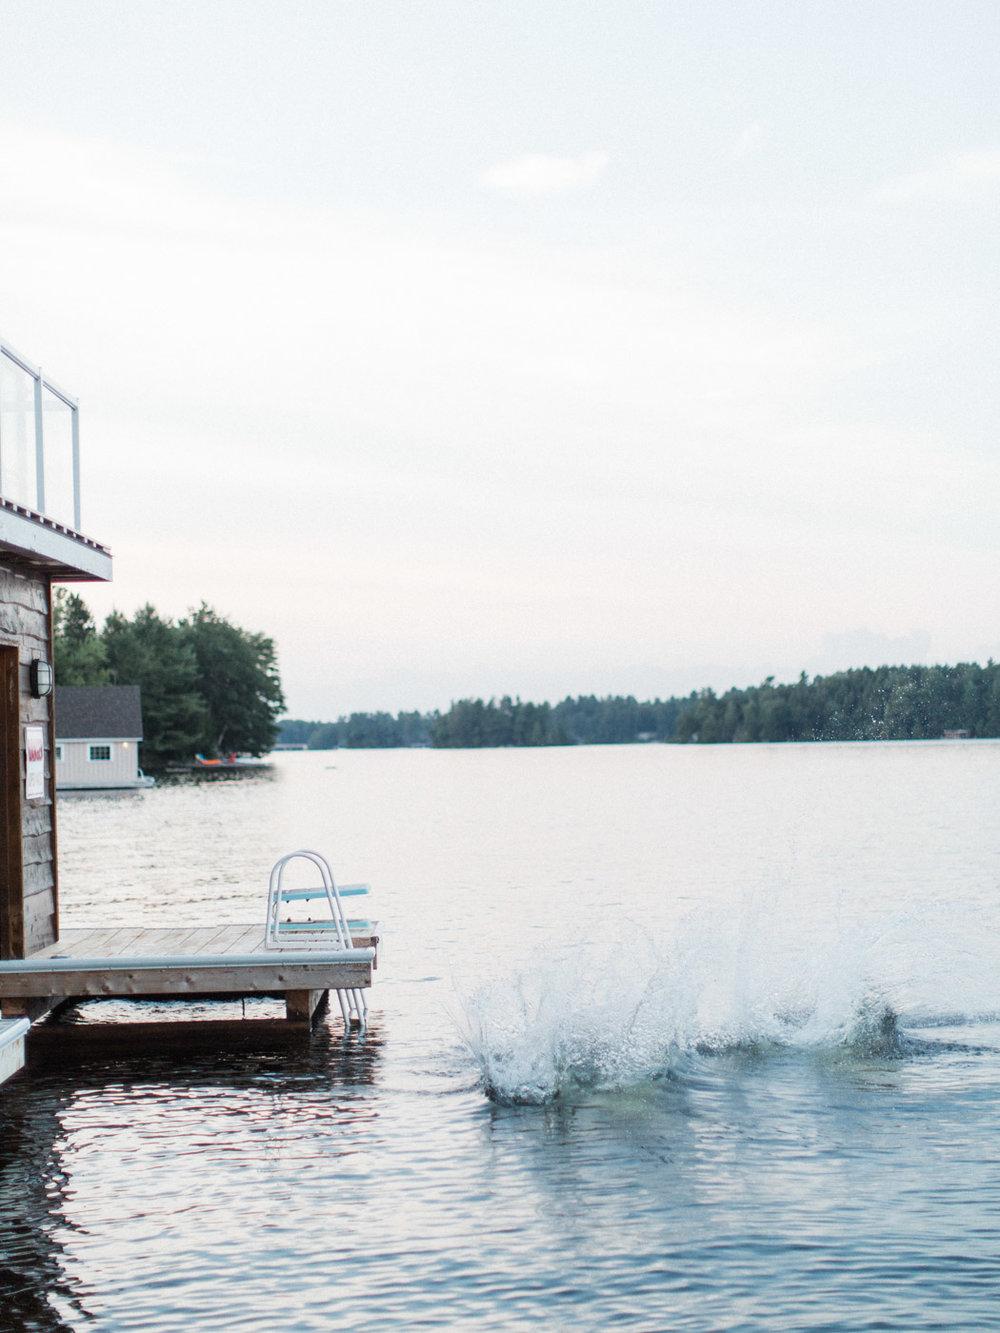 muskoka-wedding-photographer-adventurous-couples-engagement-session-lake-113.jpg